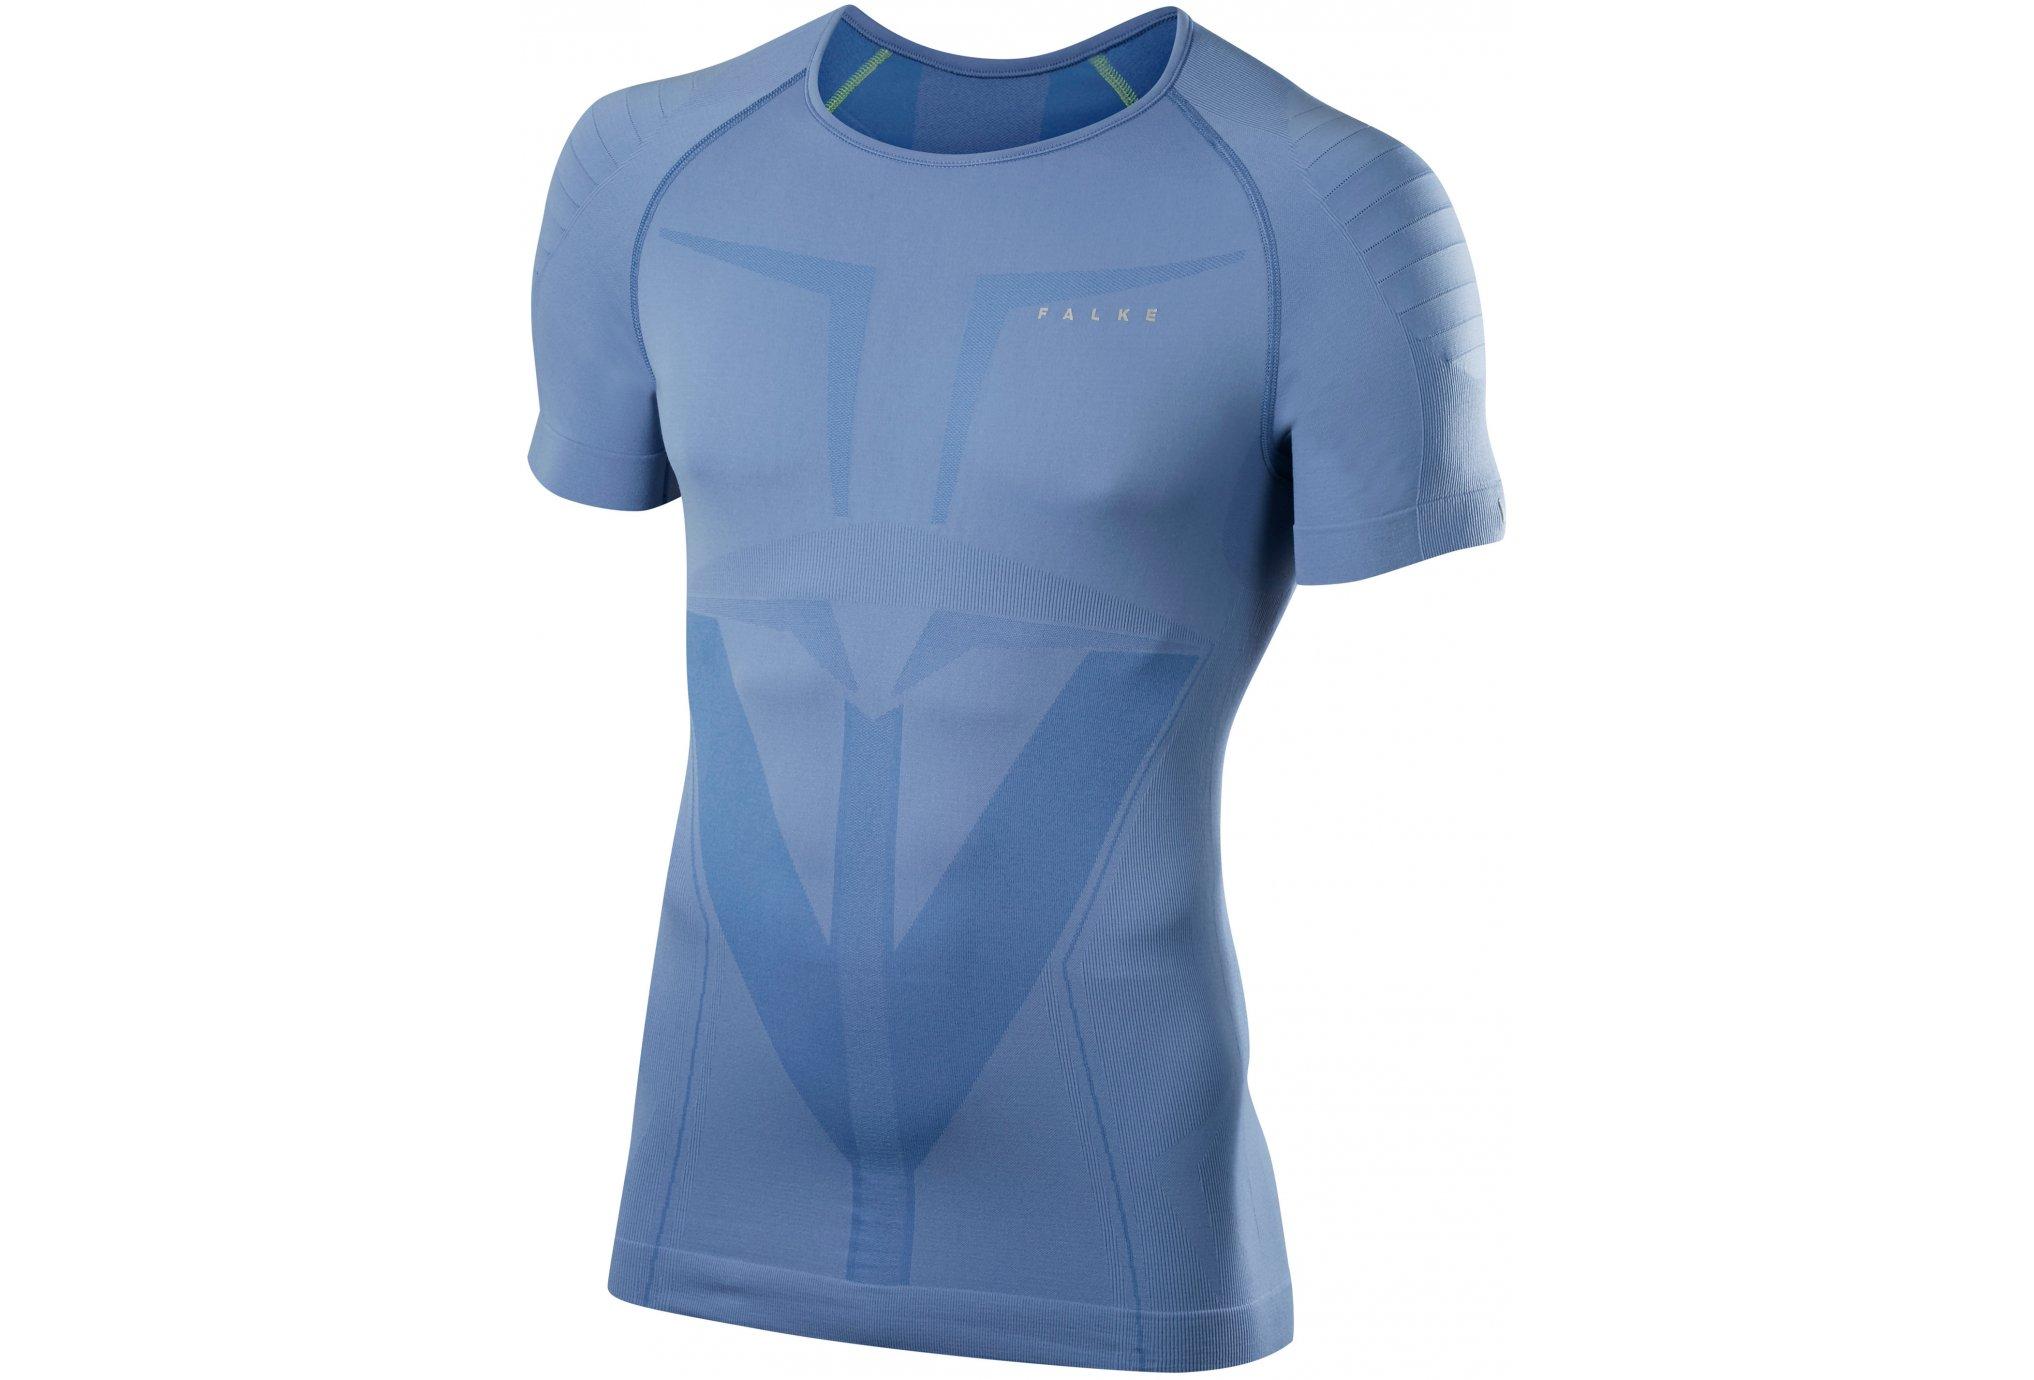 Falke Tee-shirt Athletic ShortSleeved M Diététique Vêtements homme